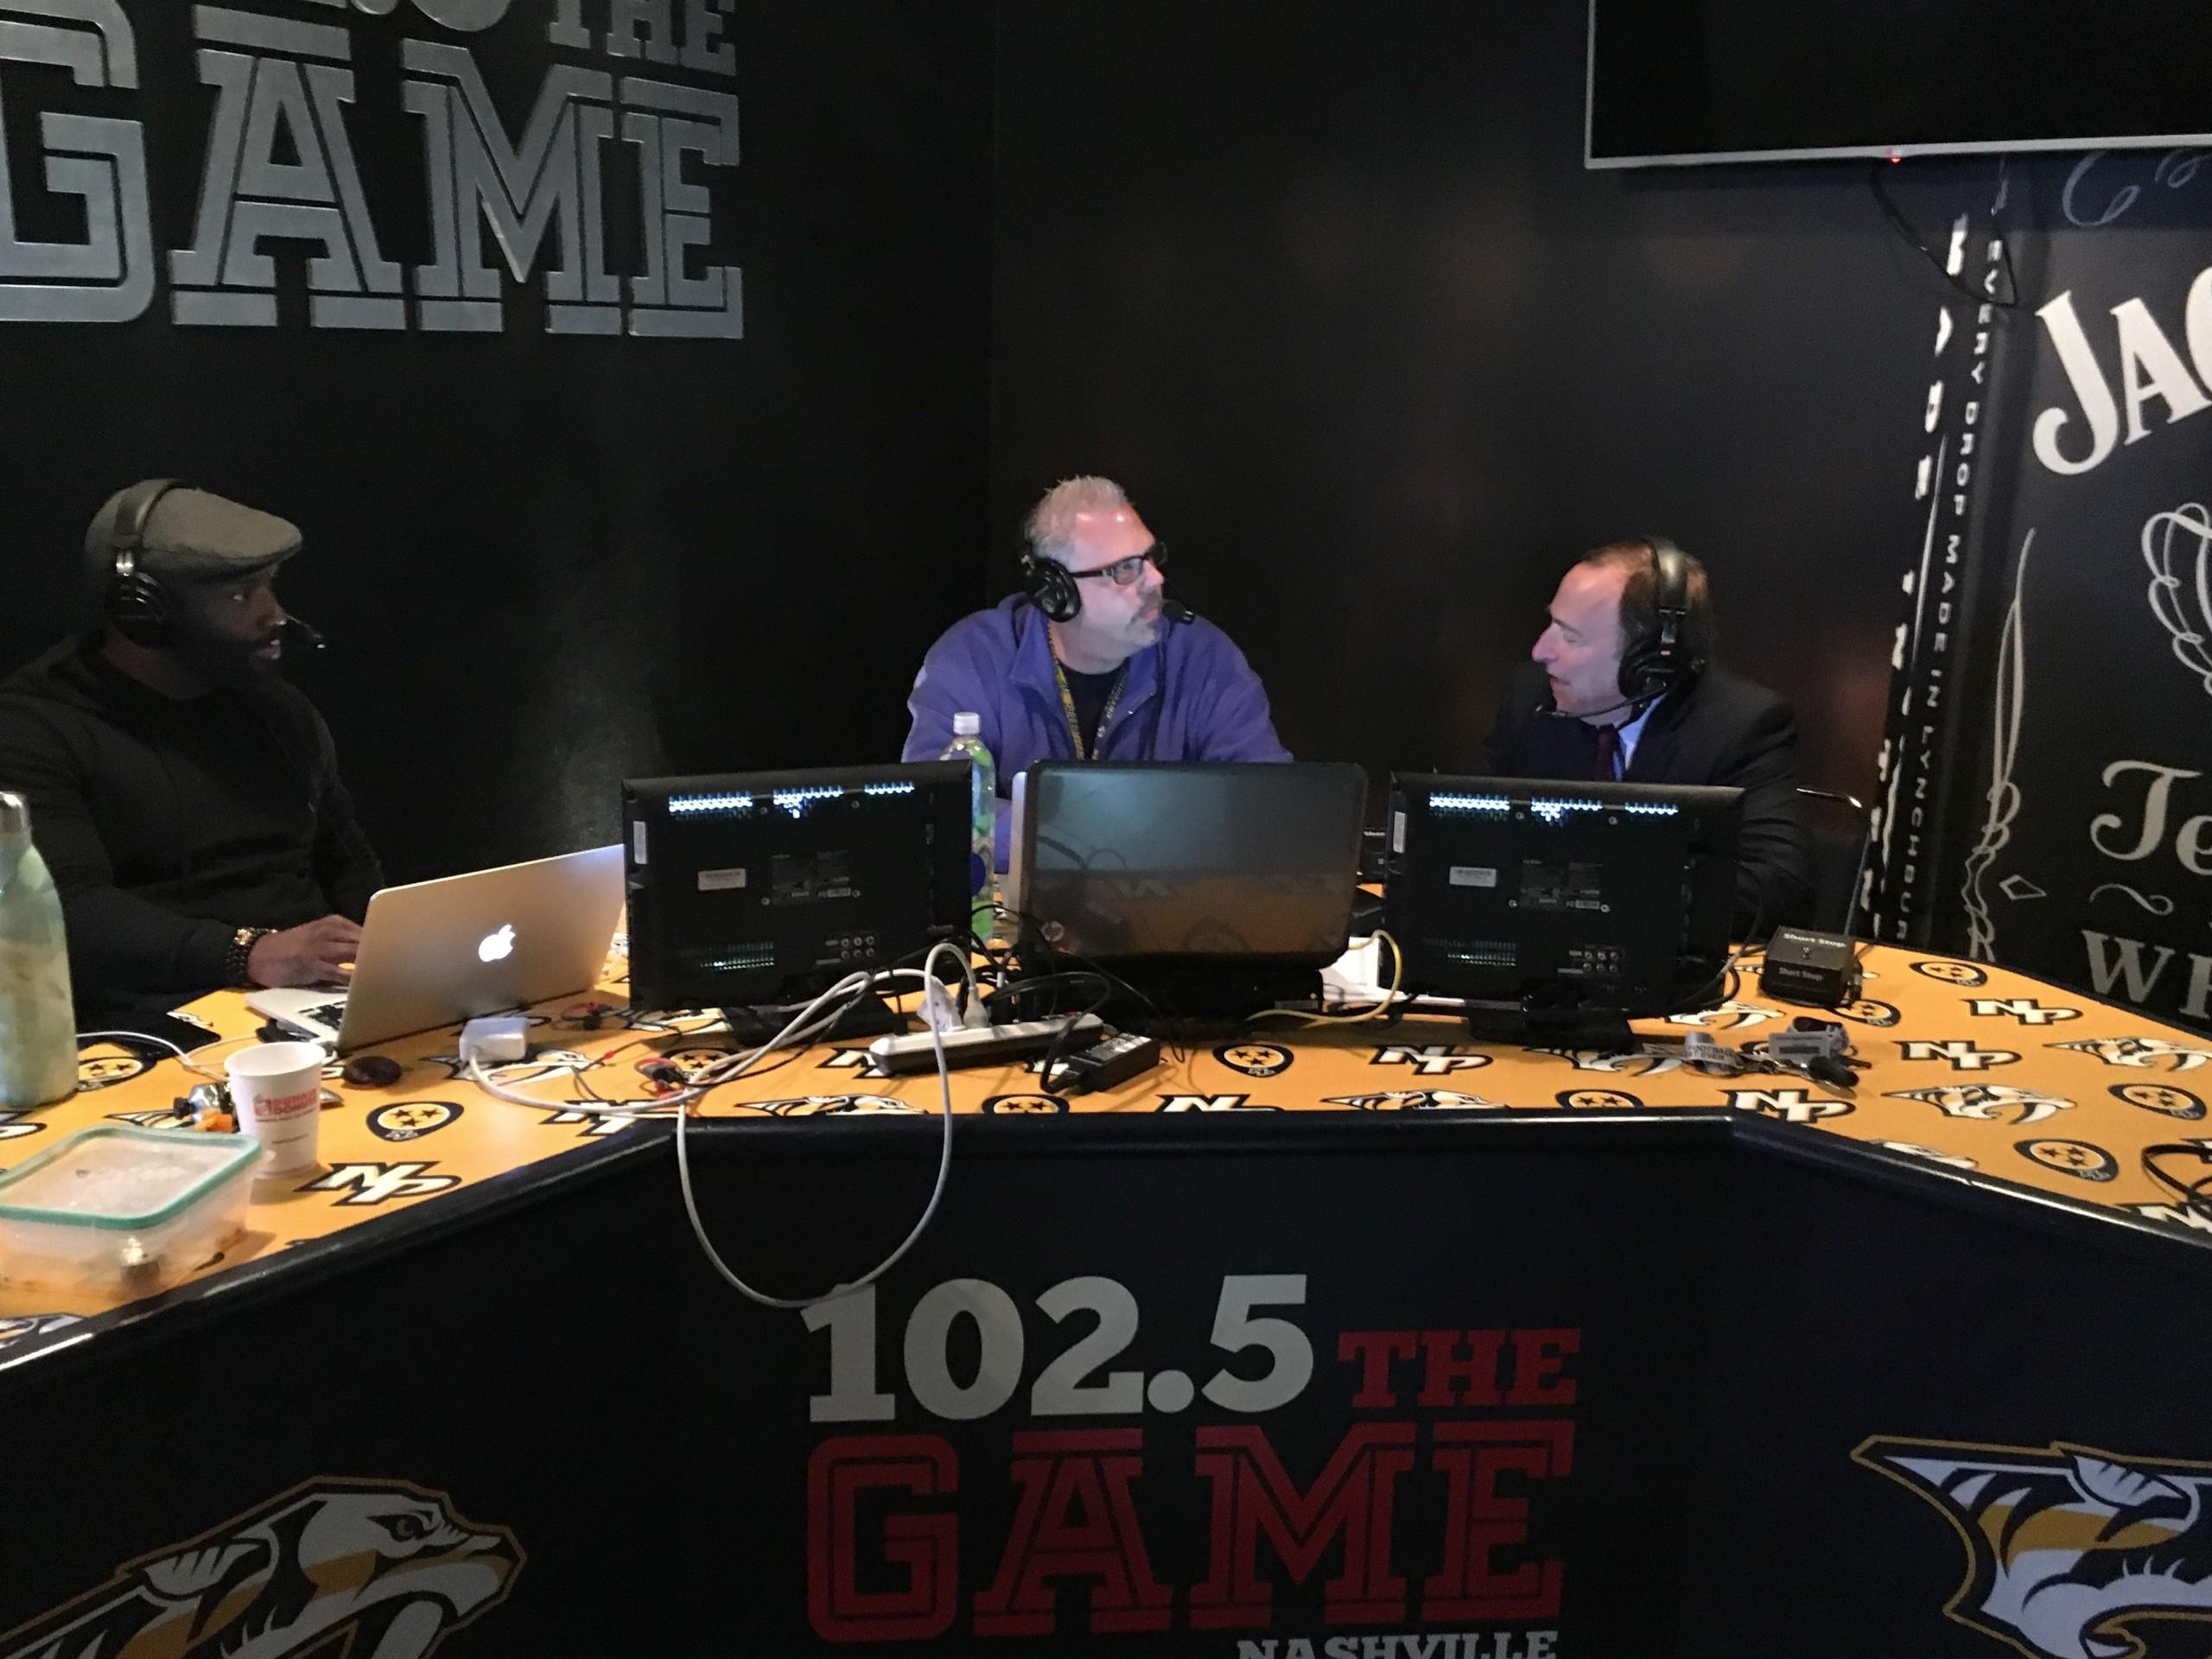 NHL Commissioner Gary Bettman Joins 3D